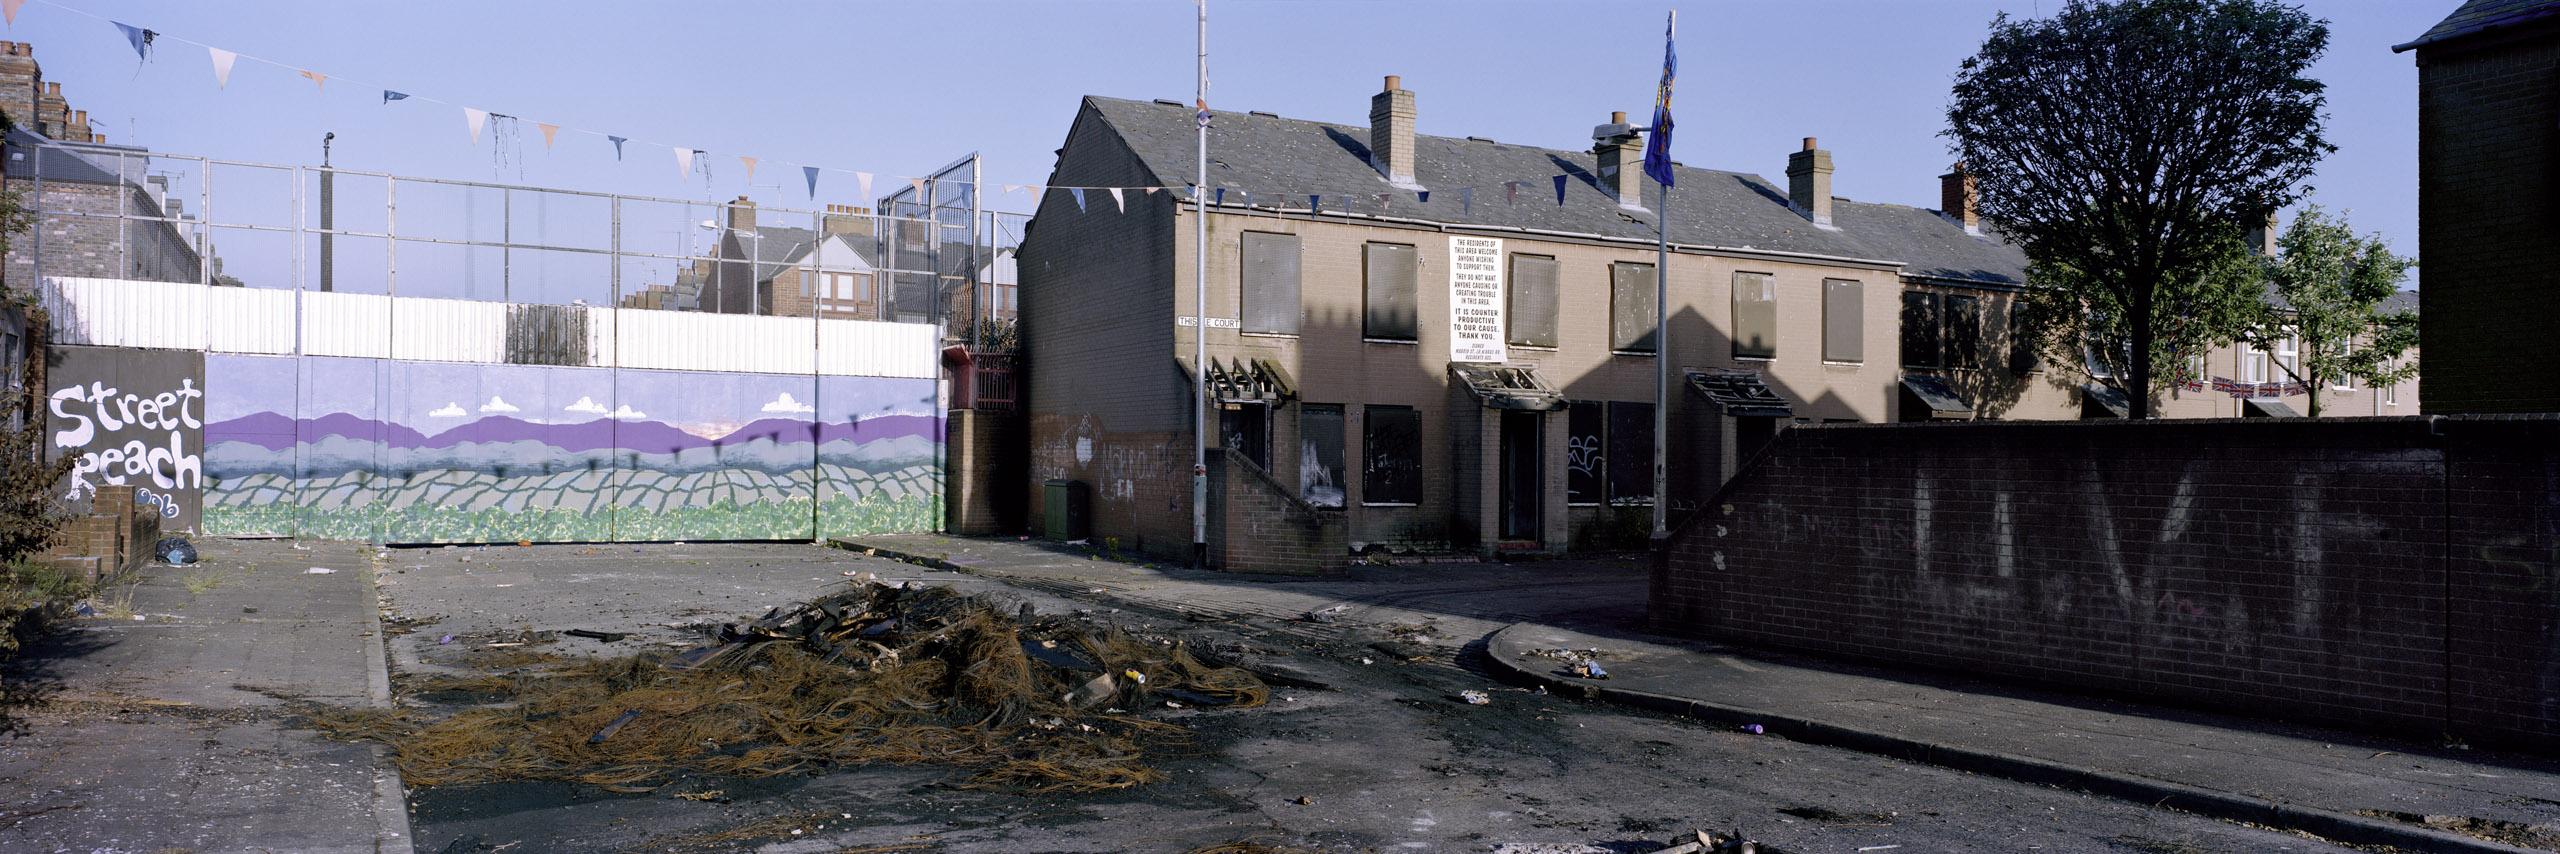 Madrid Street, Belfast. Northern Ireland, 2009.